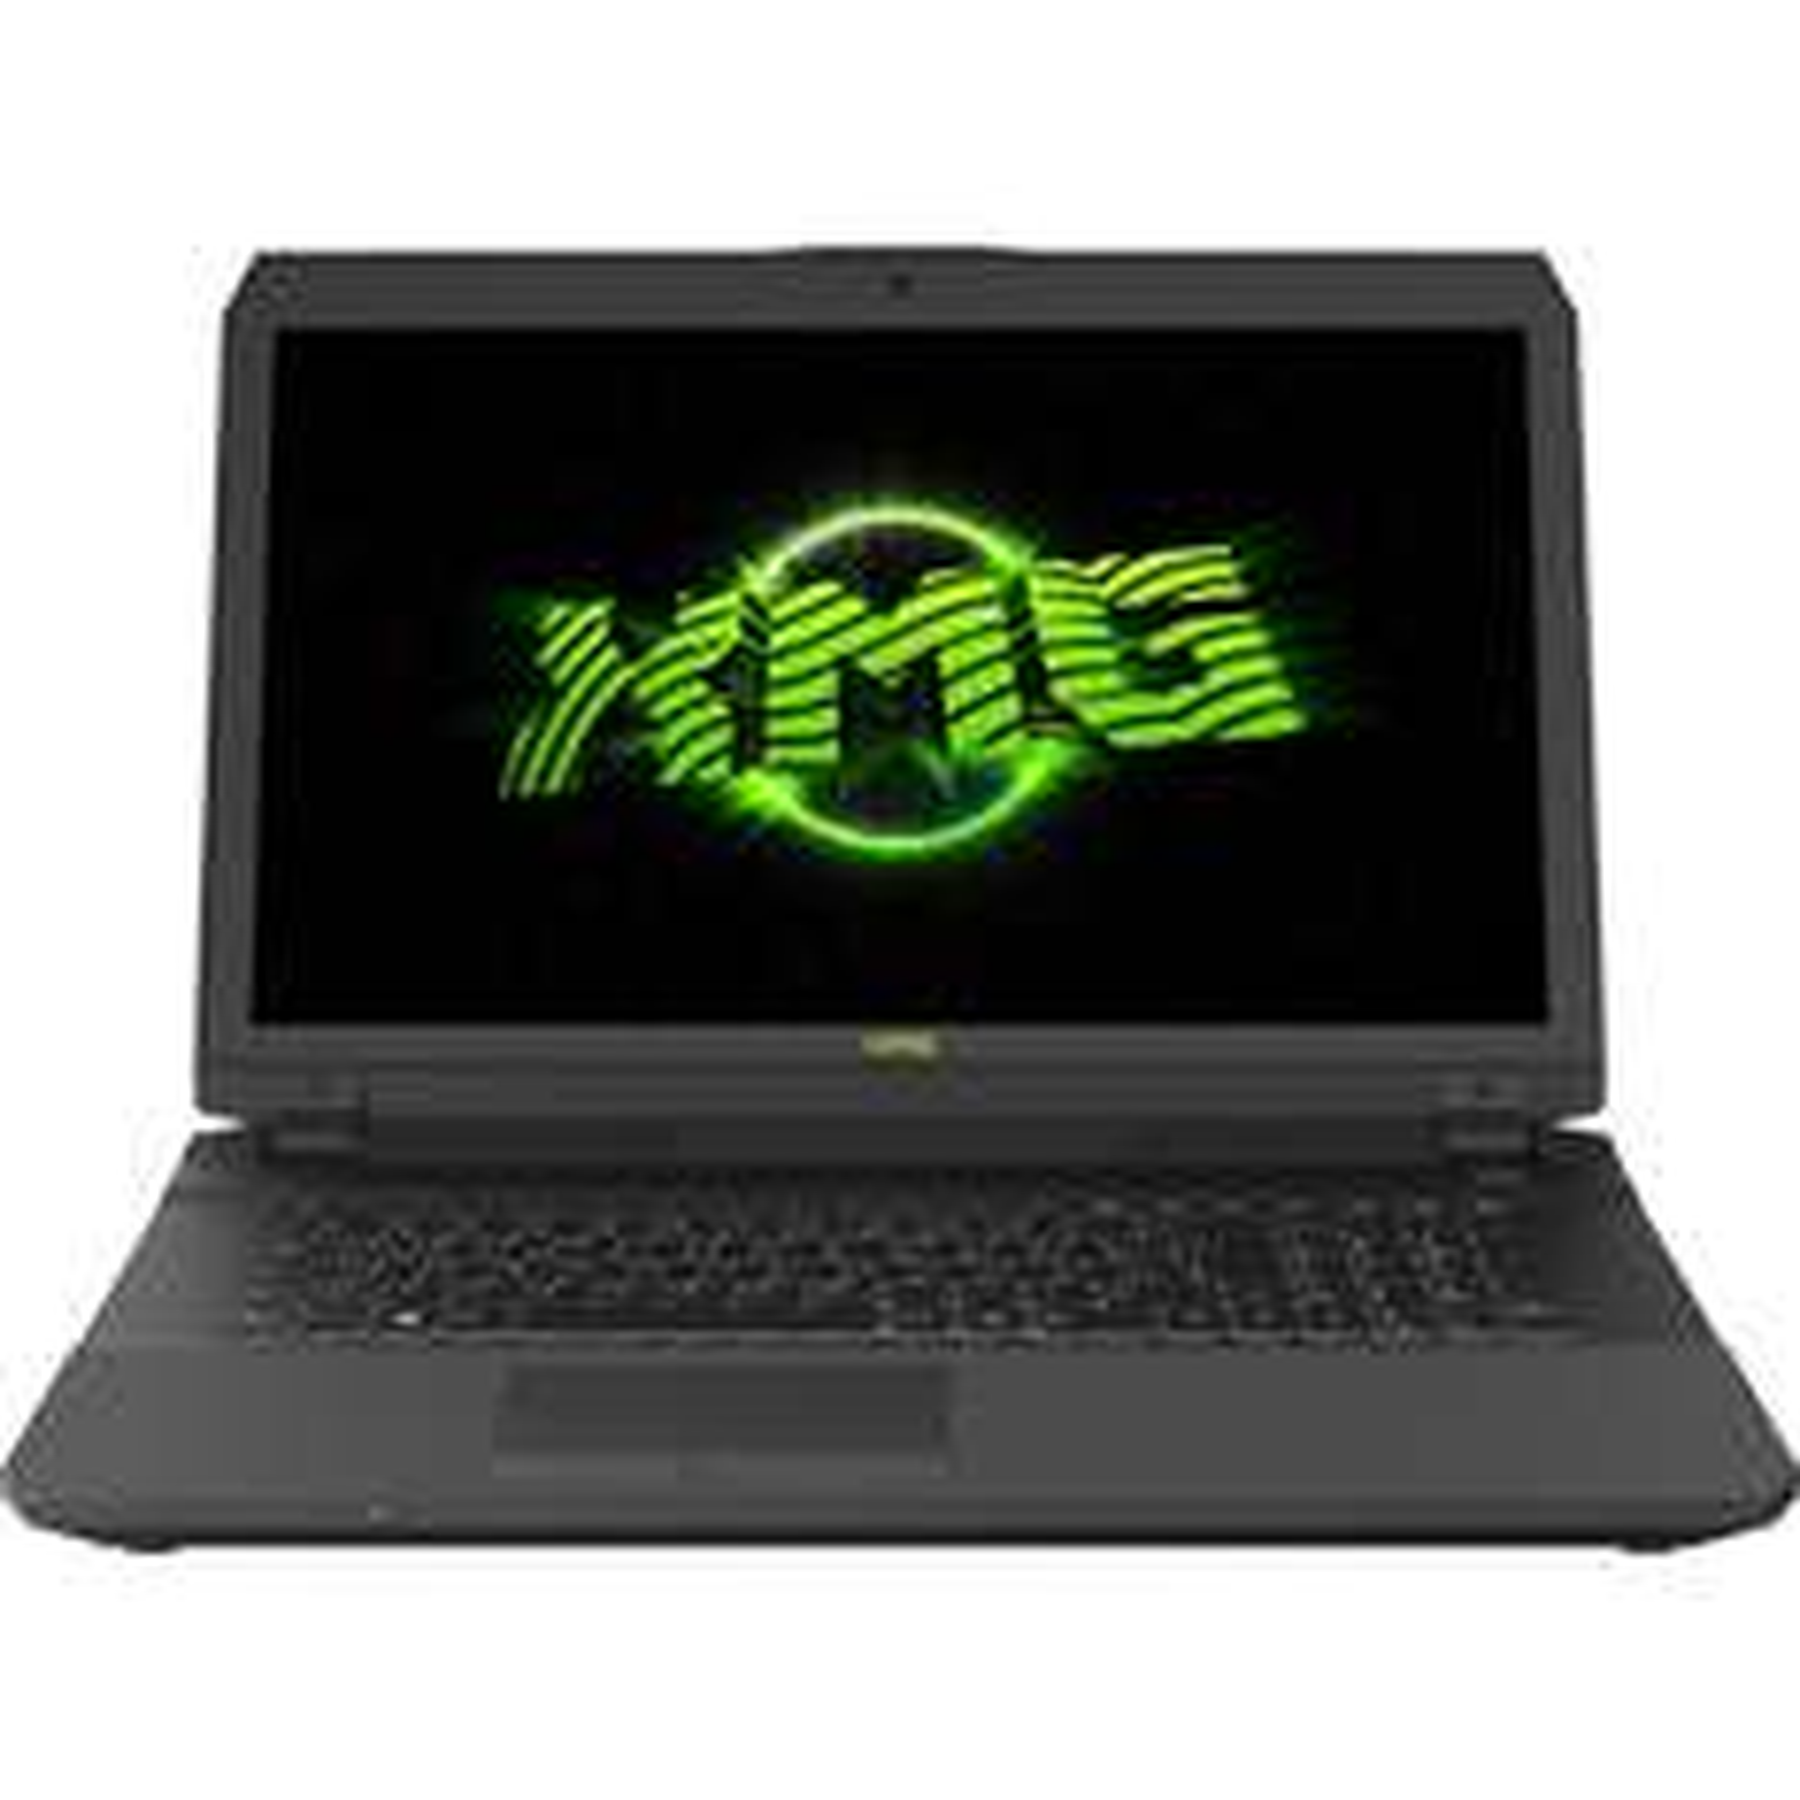 "SCHENKER XMG P707-gdm Gaming Notebook 17,3"" Full HD IPS, Intel Core i7-6700HQ, 16GB, 500GB SSD, Geforce GTX 1070"